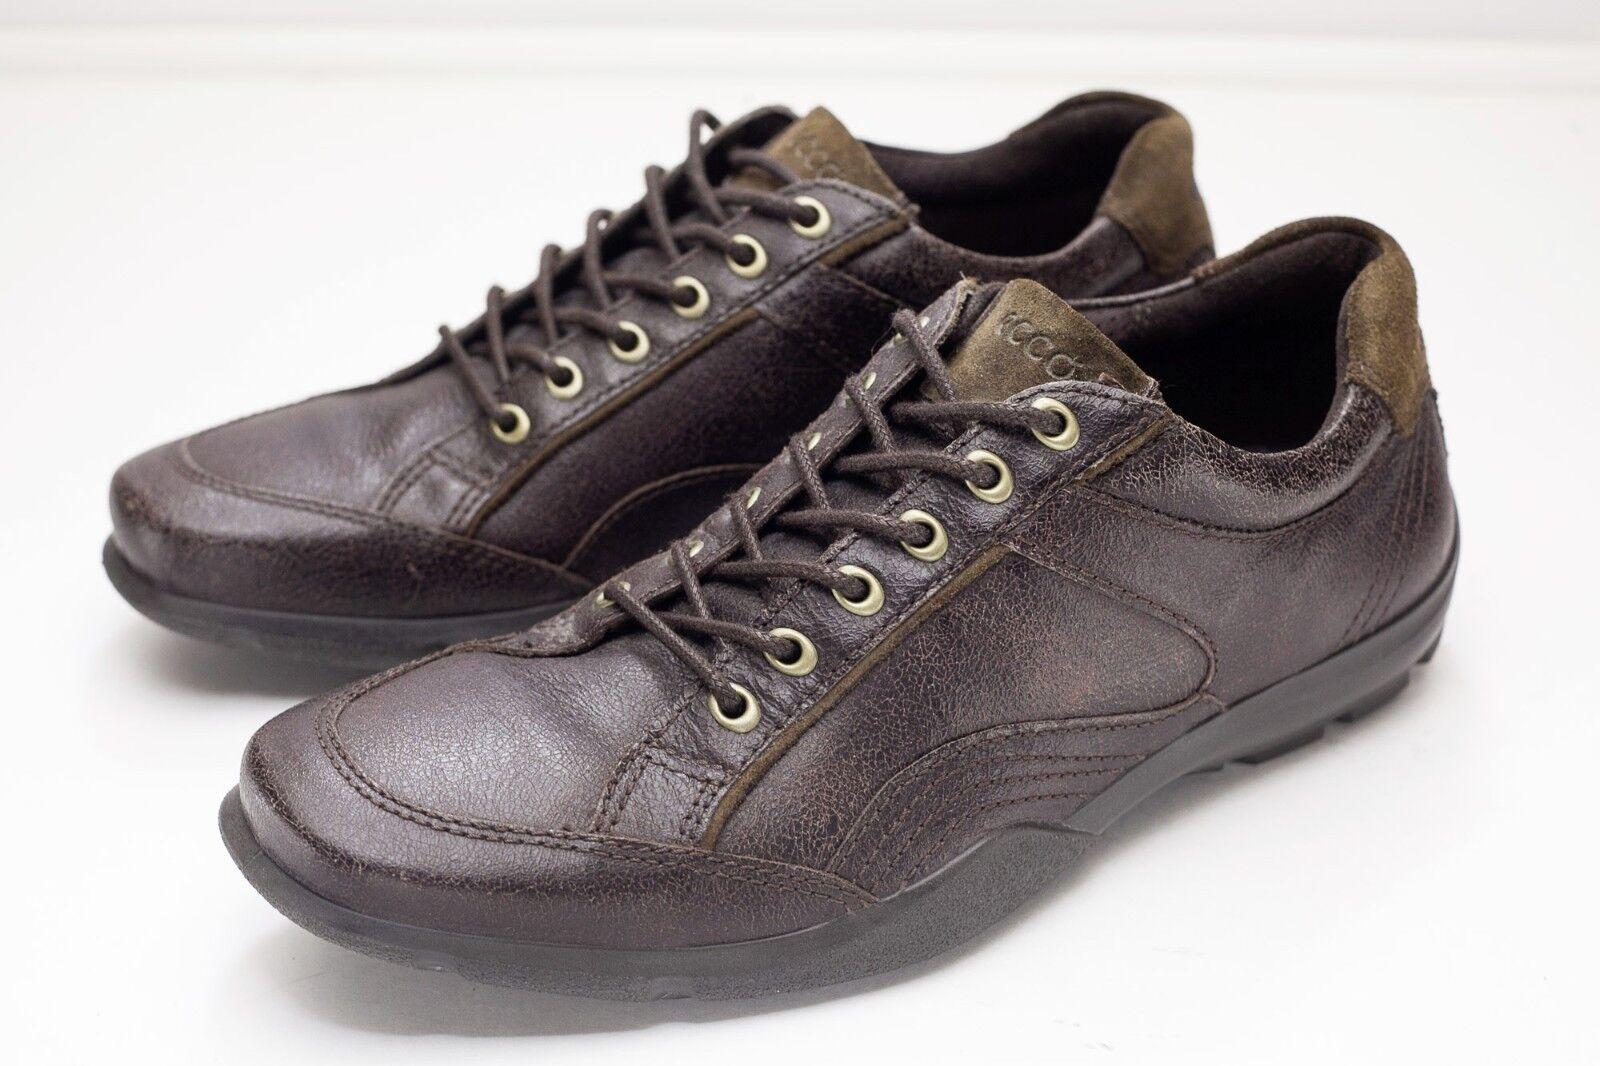 Ecco 9 9.5 Brown Oxford Casual Men's